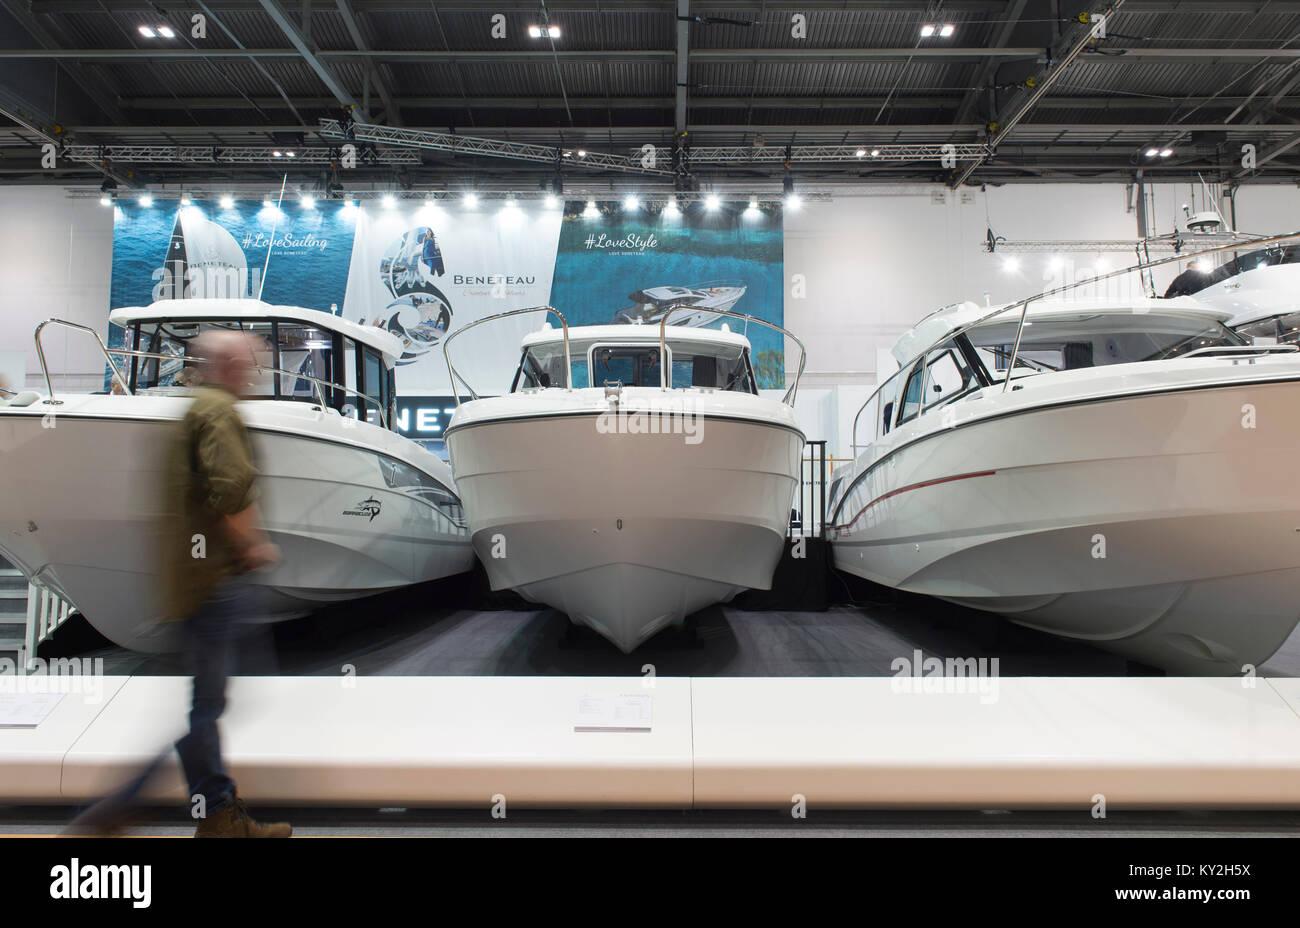 Jeanneau Boats Stand Stock Photos & Jeanneau Boats Stand